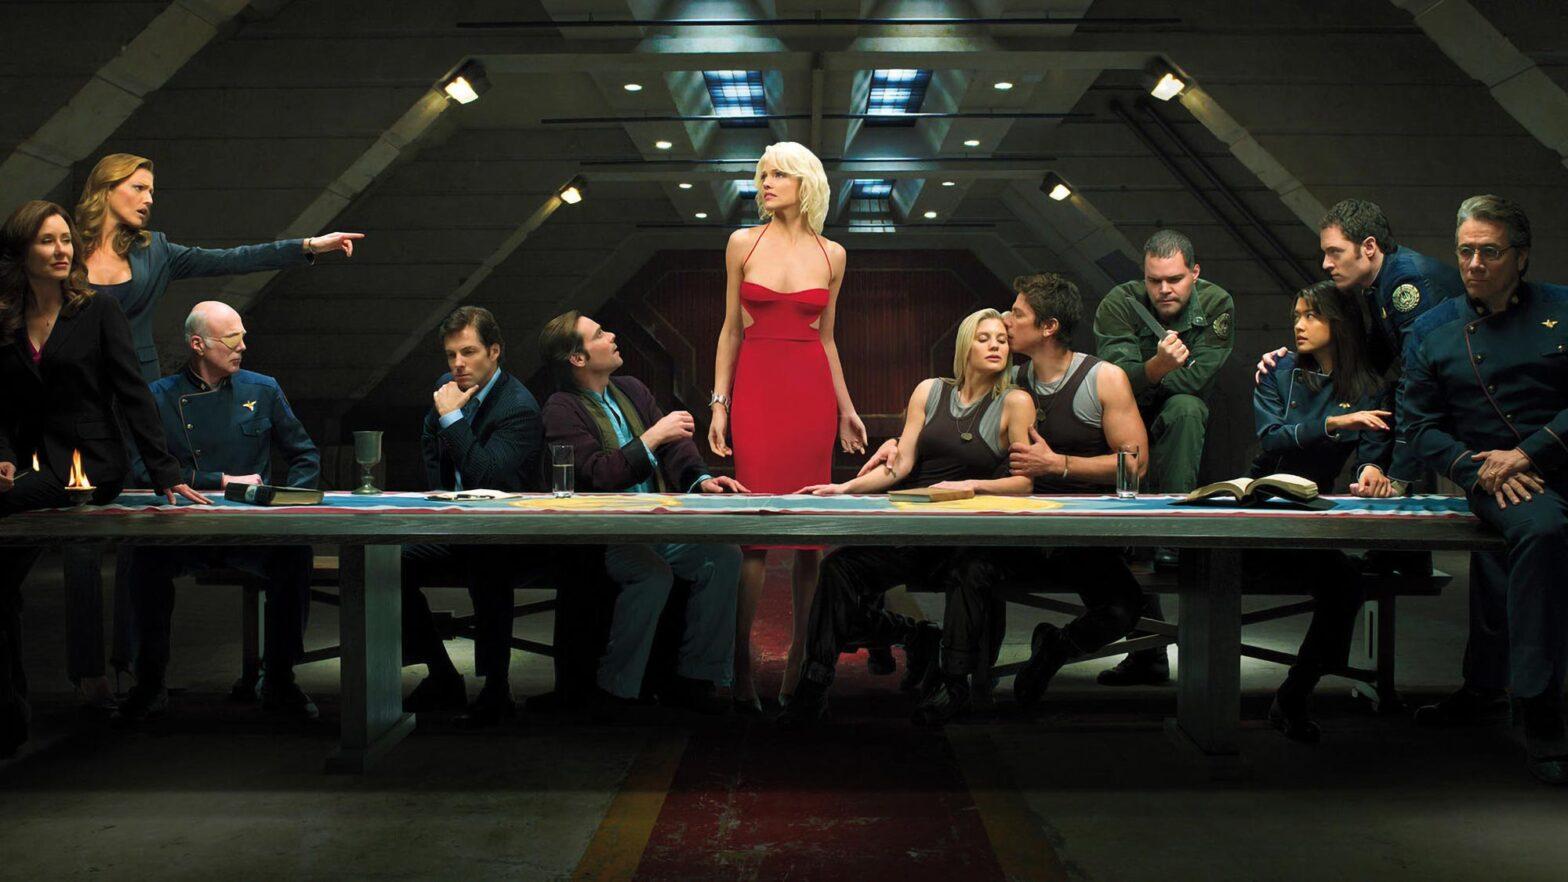 NBC New Battlestar Galactica Series